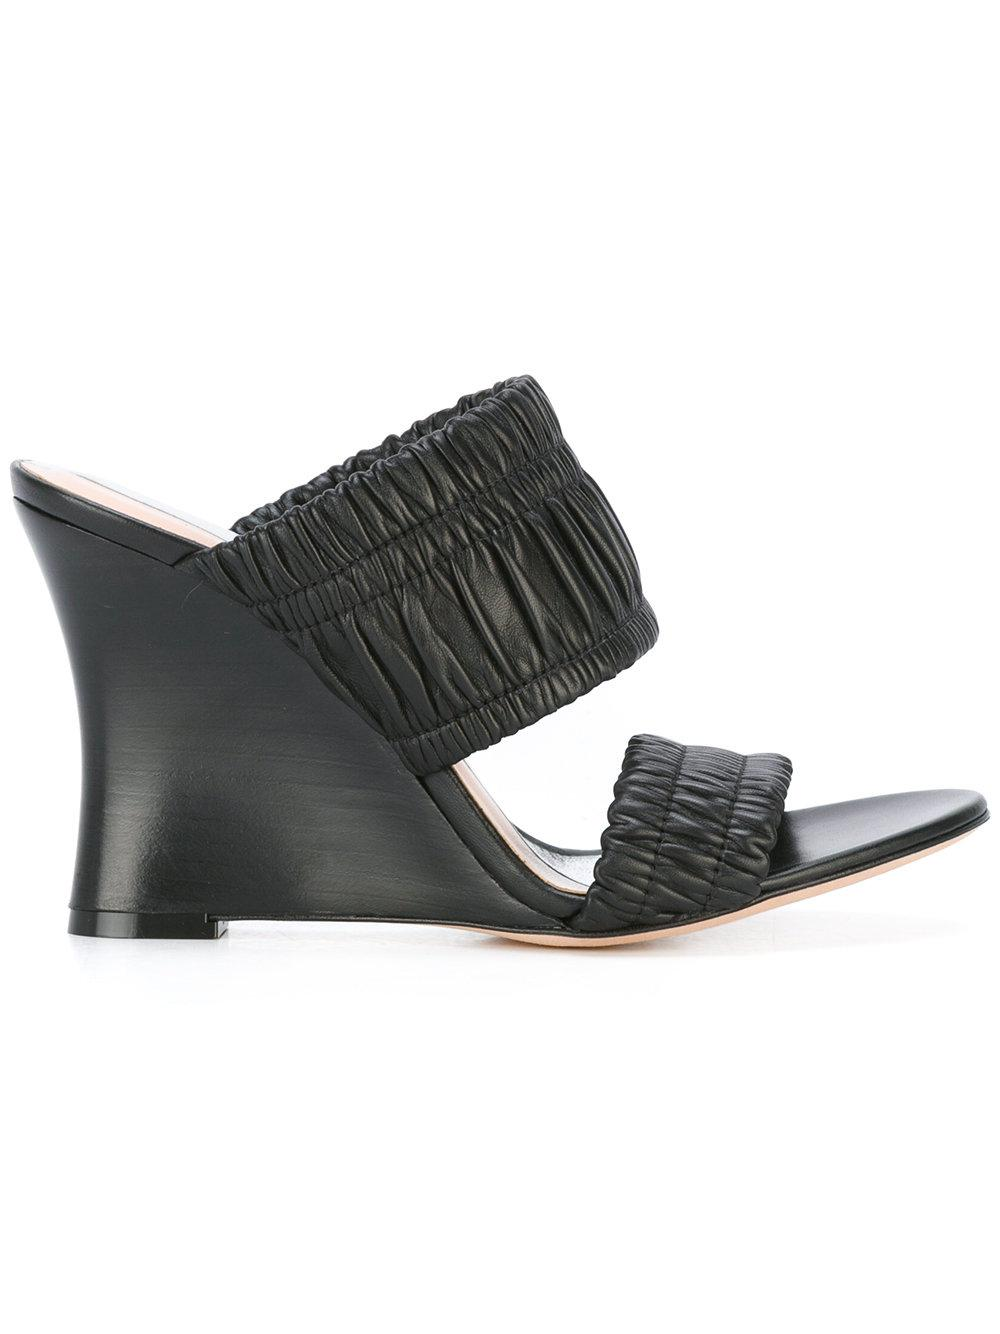 d65808f5639 Lyst - Alchimia Di Ballin Ribbed Straps Sandals in Black